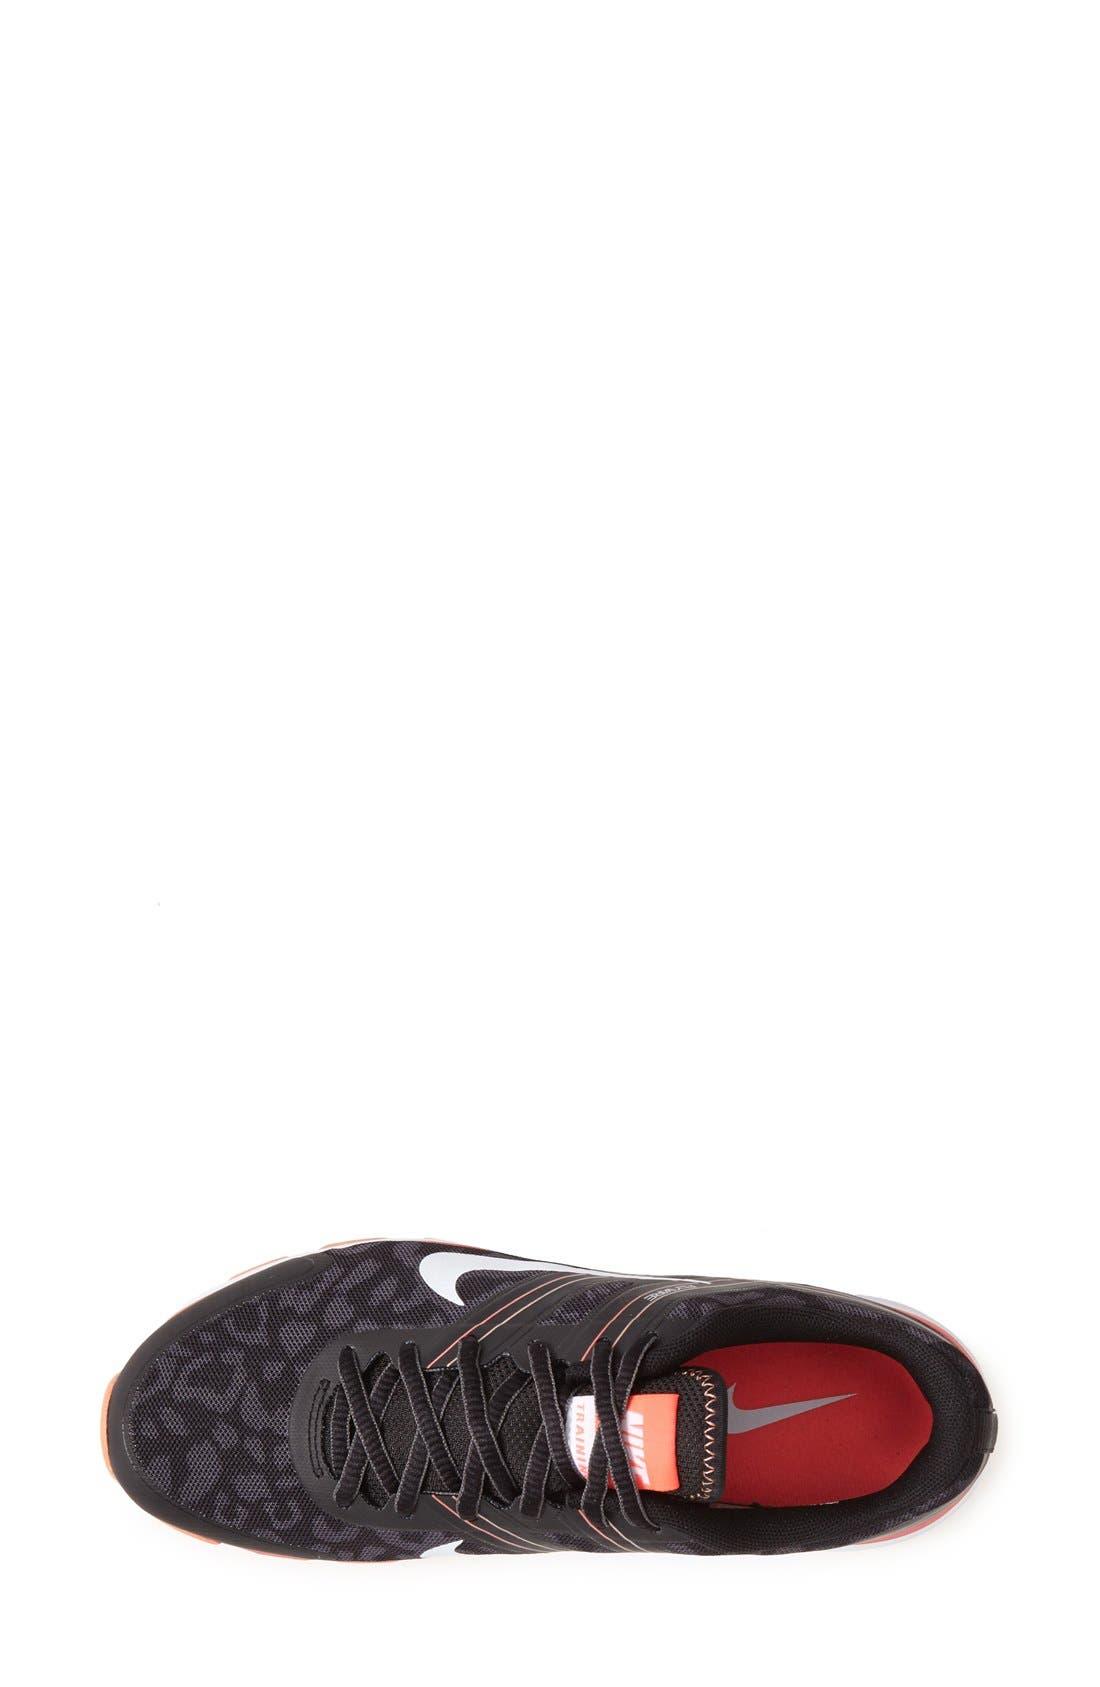 Alternate Image 3  - Nike 'Dual Fusion TR II' Training Shoe (Women)